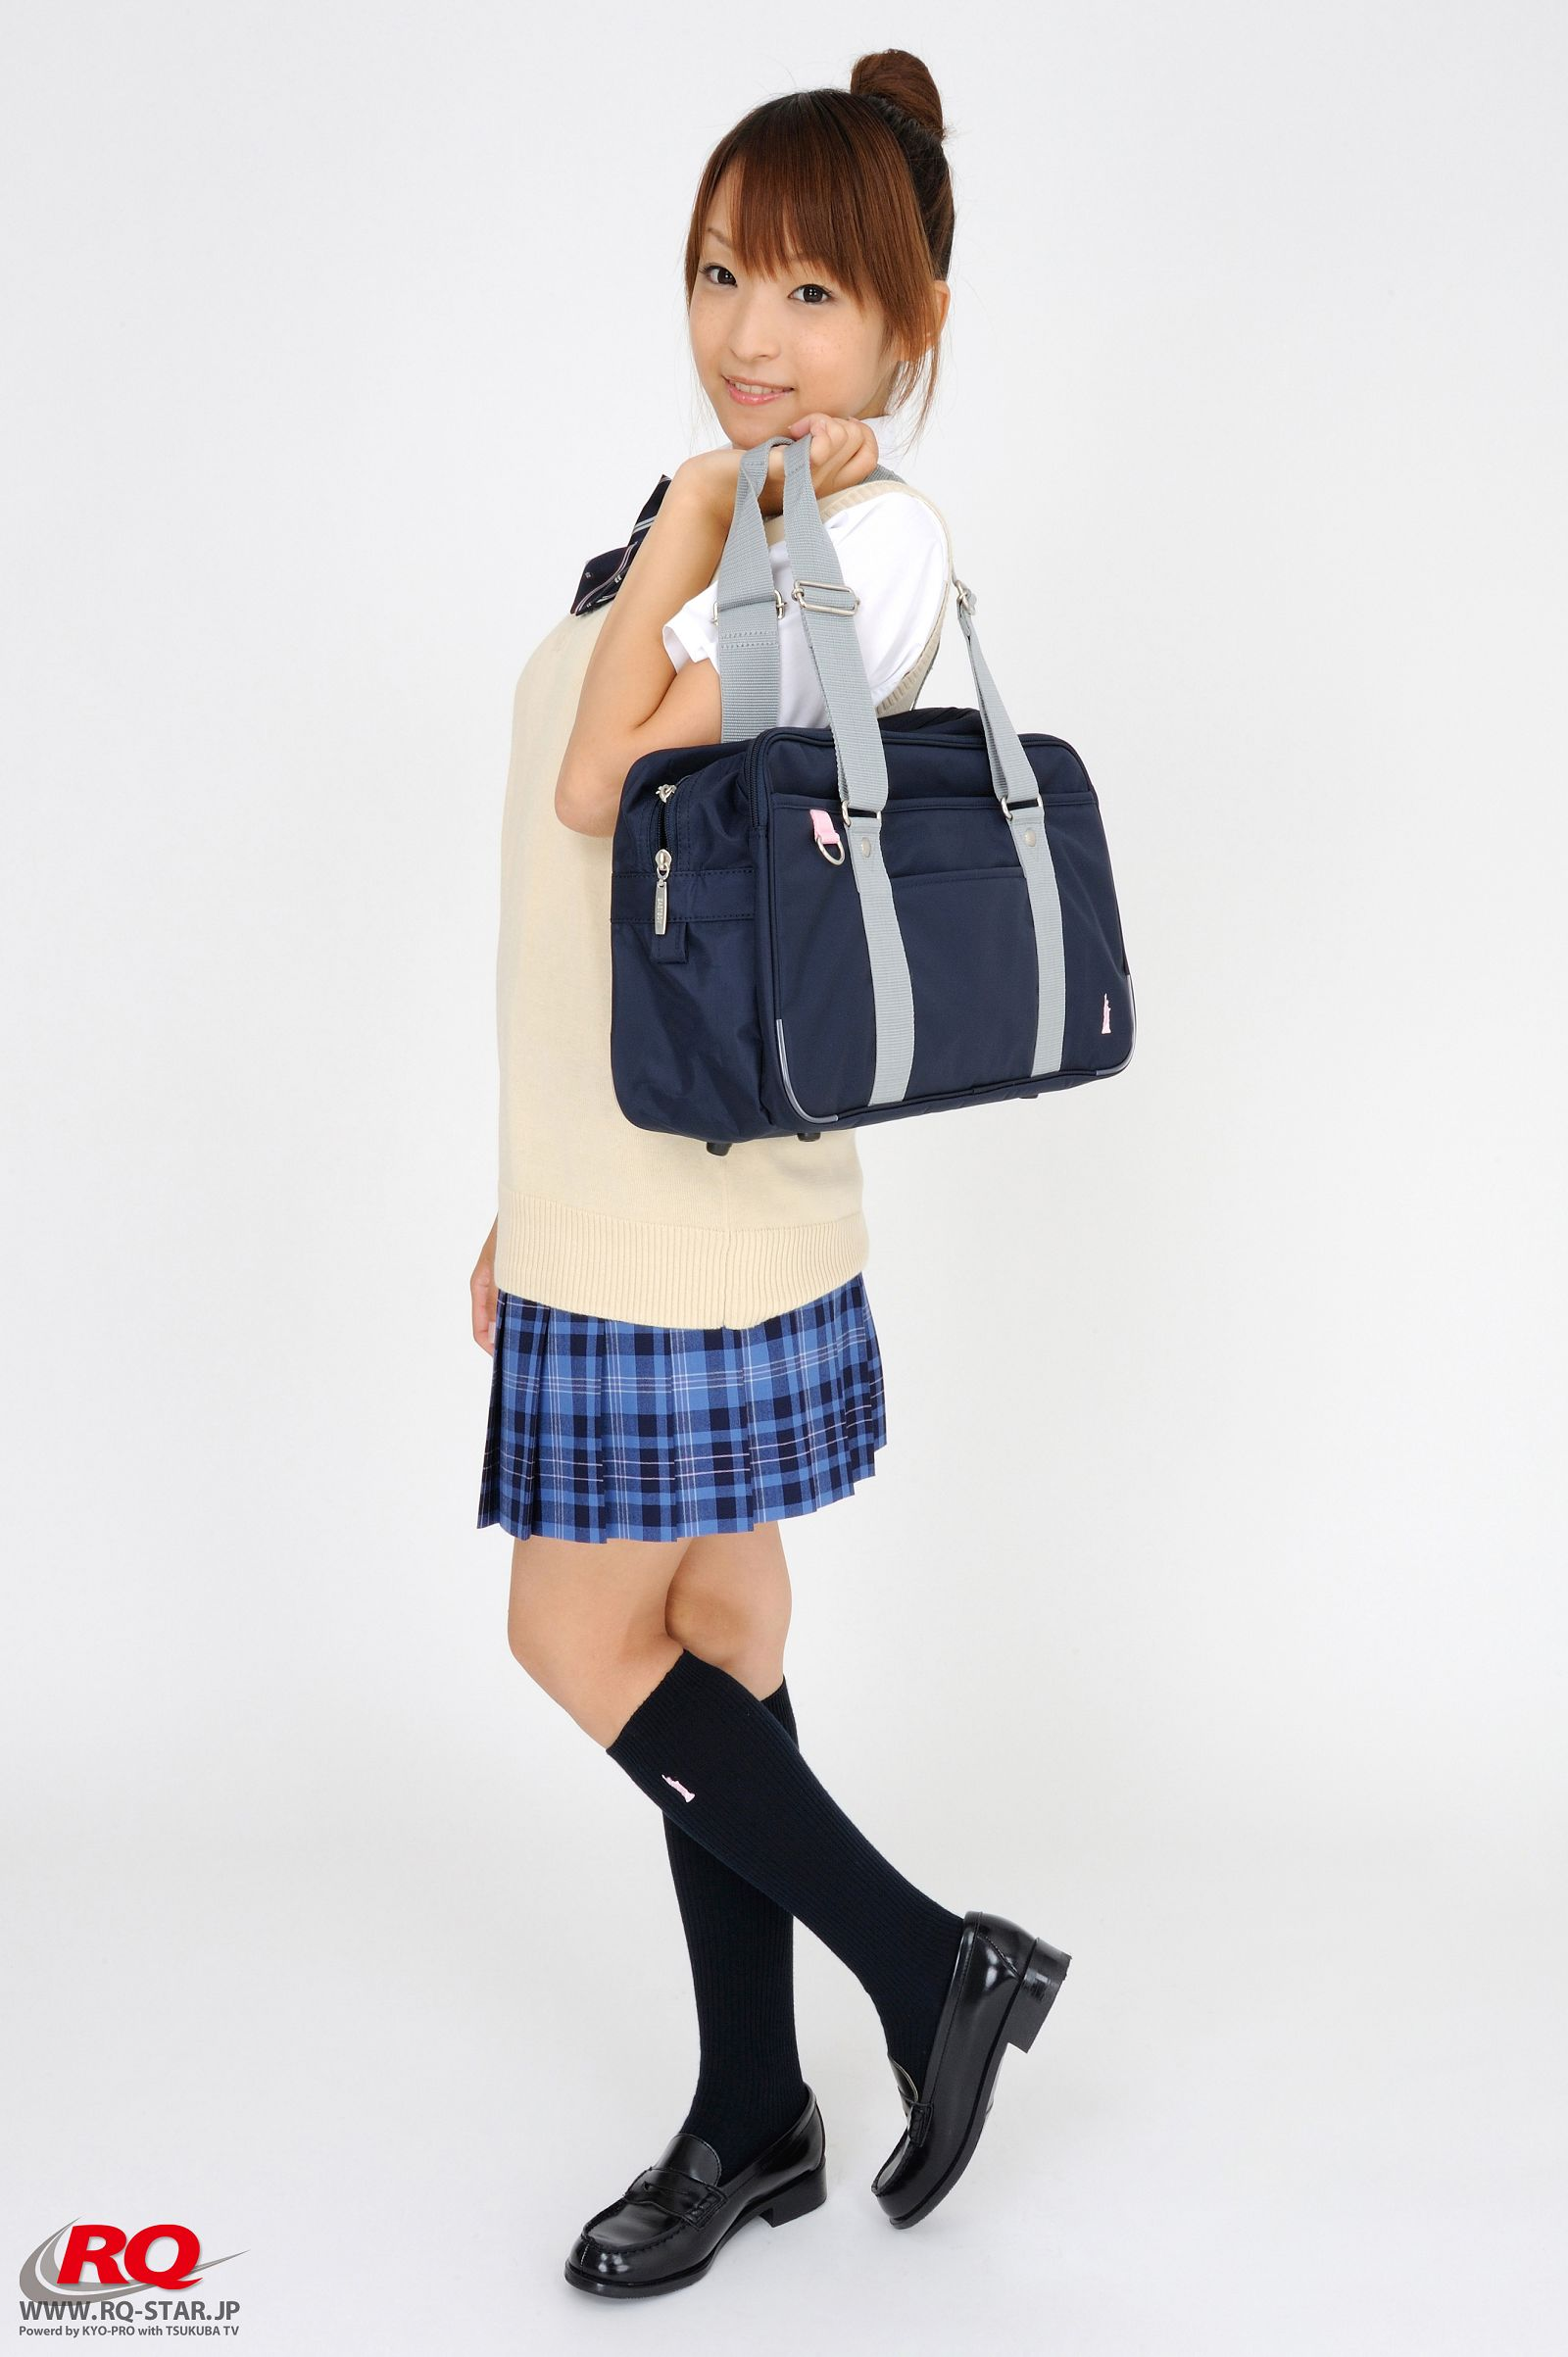 [RQ STAR美女] NO.0097 Mio Aoki 青木未央 Student Style[78P] RQ STAR 第2张